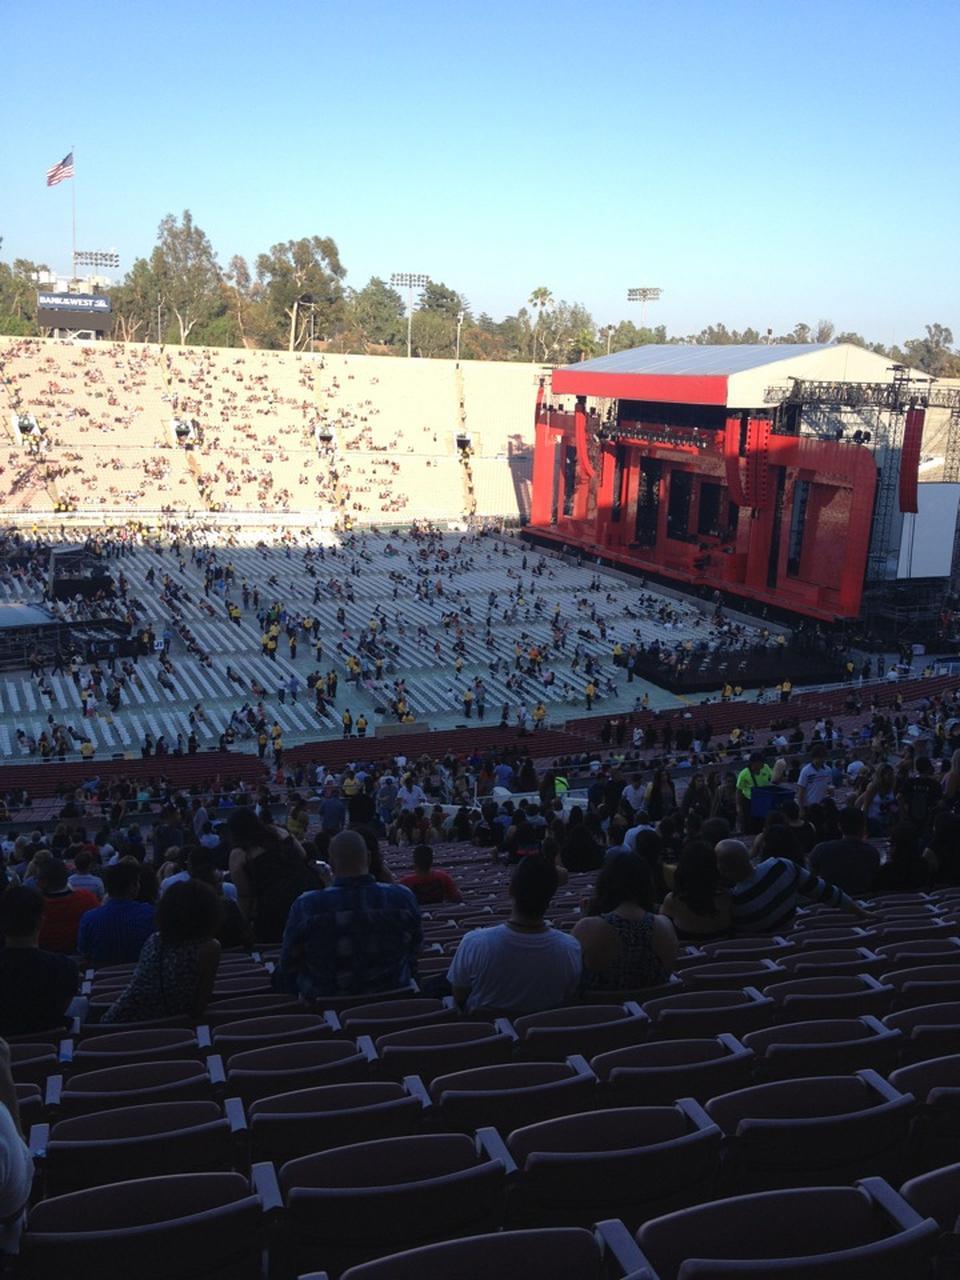 rose bowl seating chart concert wallseatco